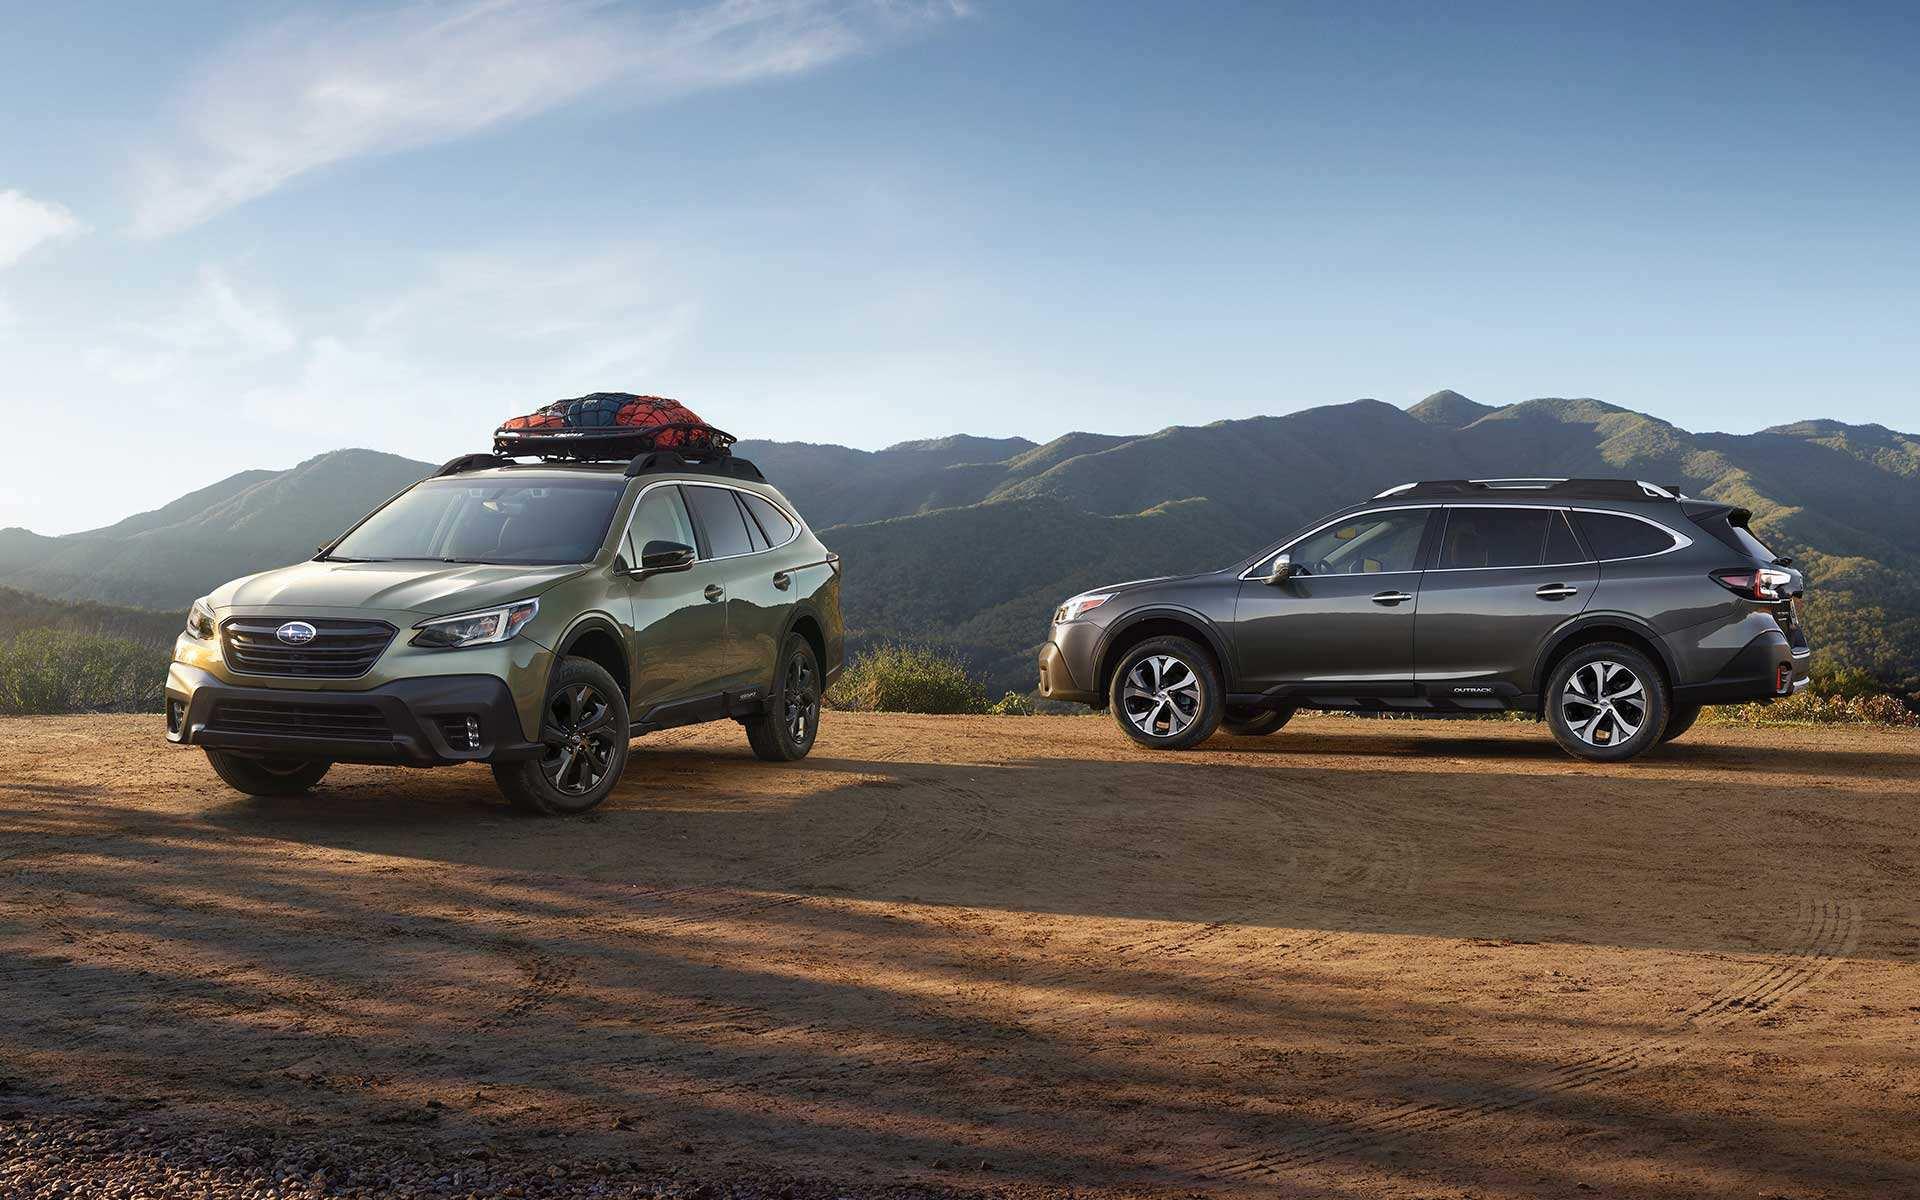 42 New Subaru Suv 2020 Redesign and Concept by Subaru Suv 2020